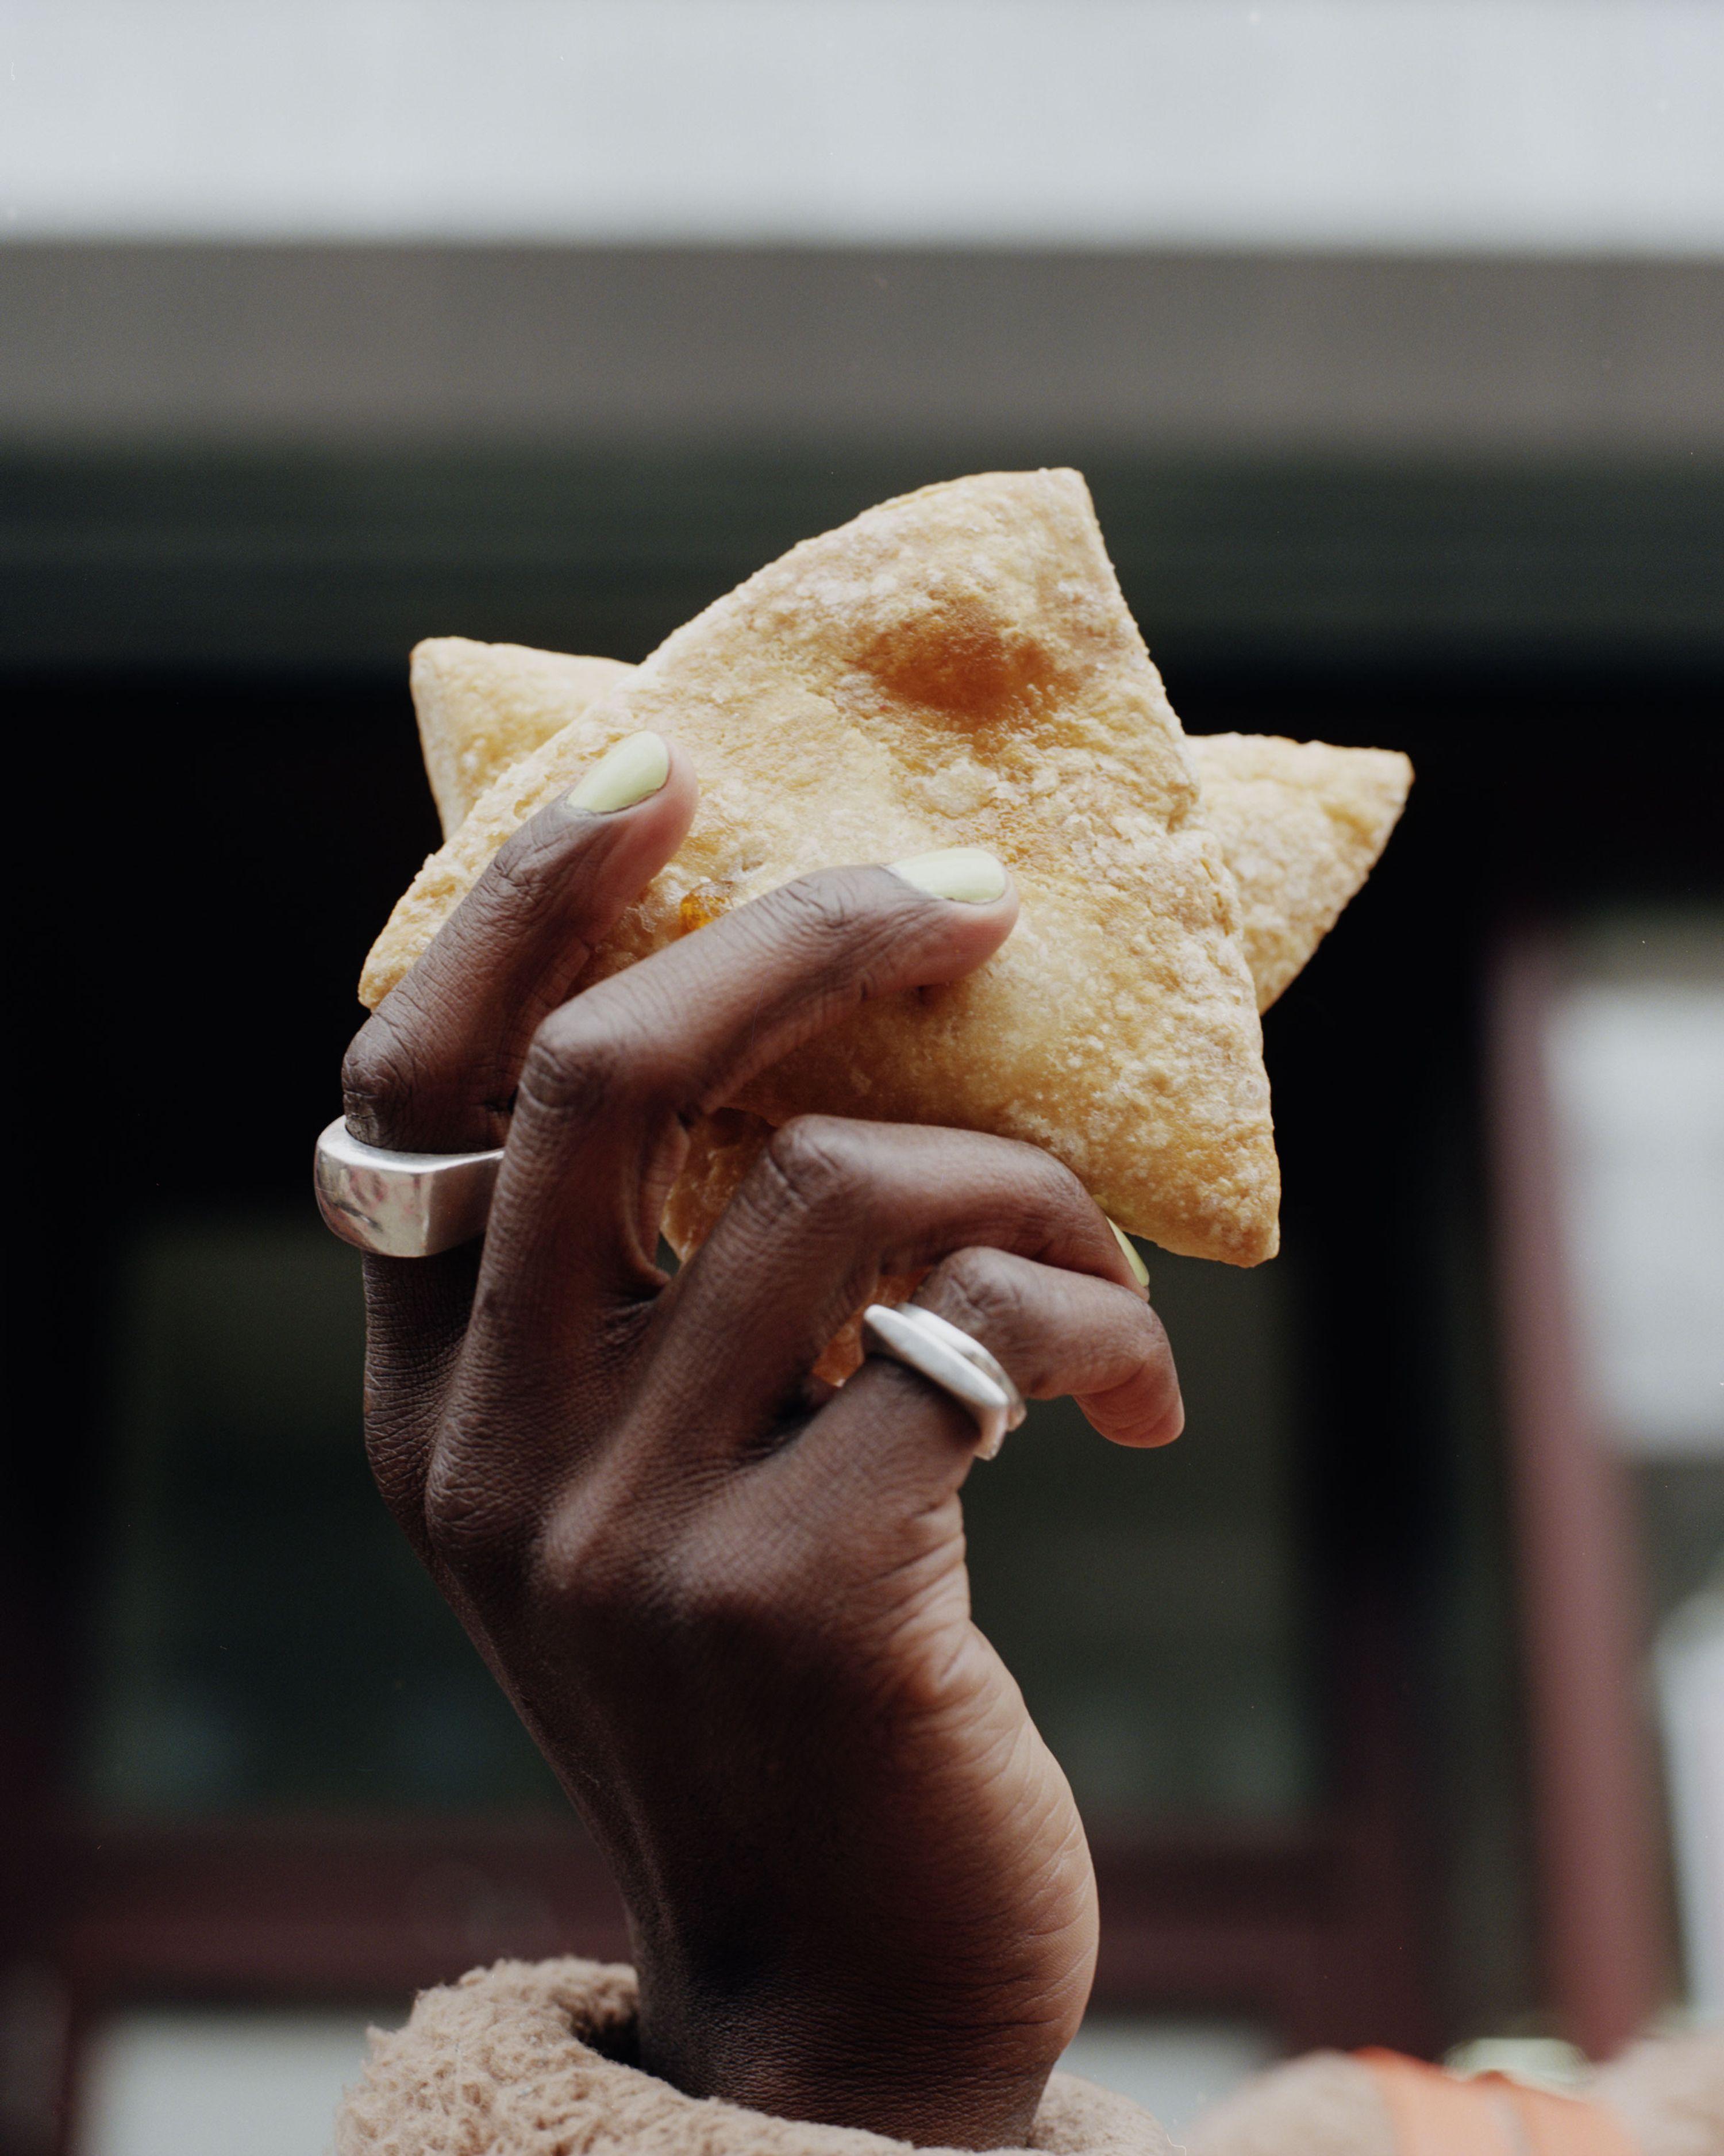 Pastries in Devonn Francis' hand.